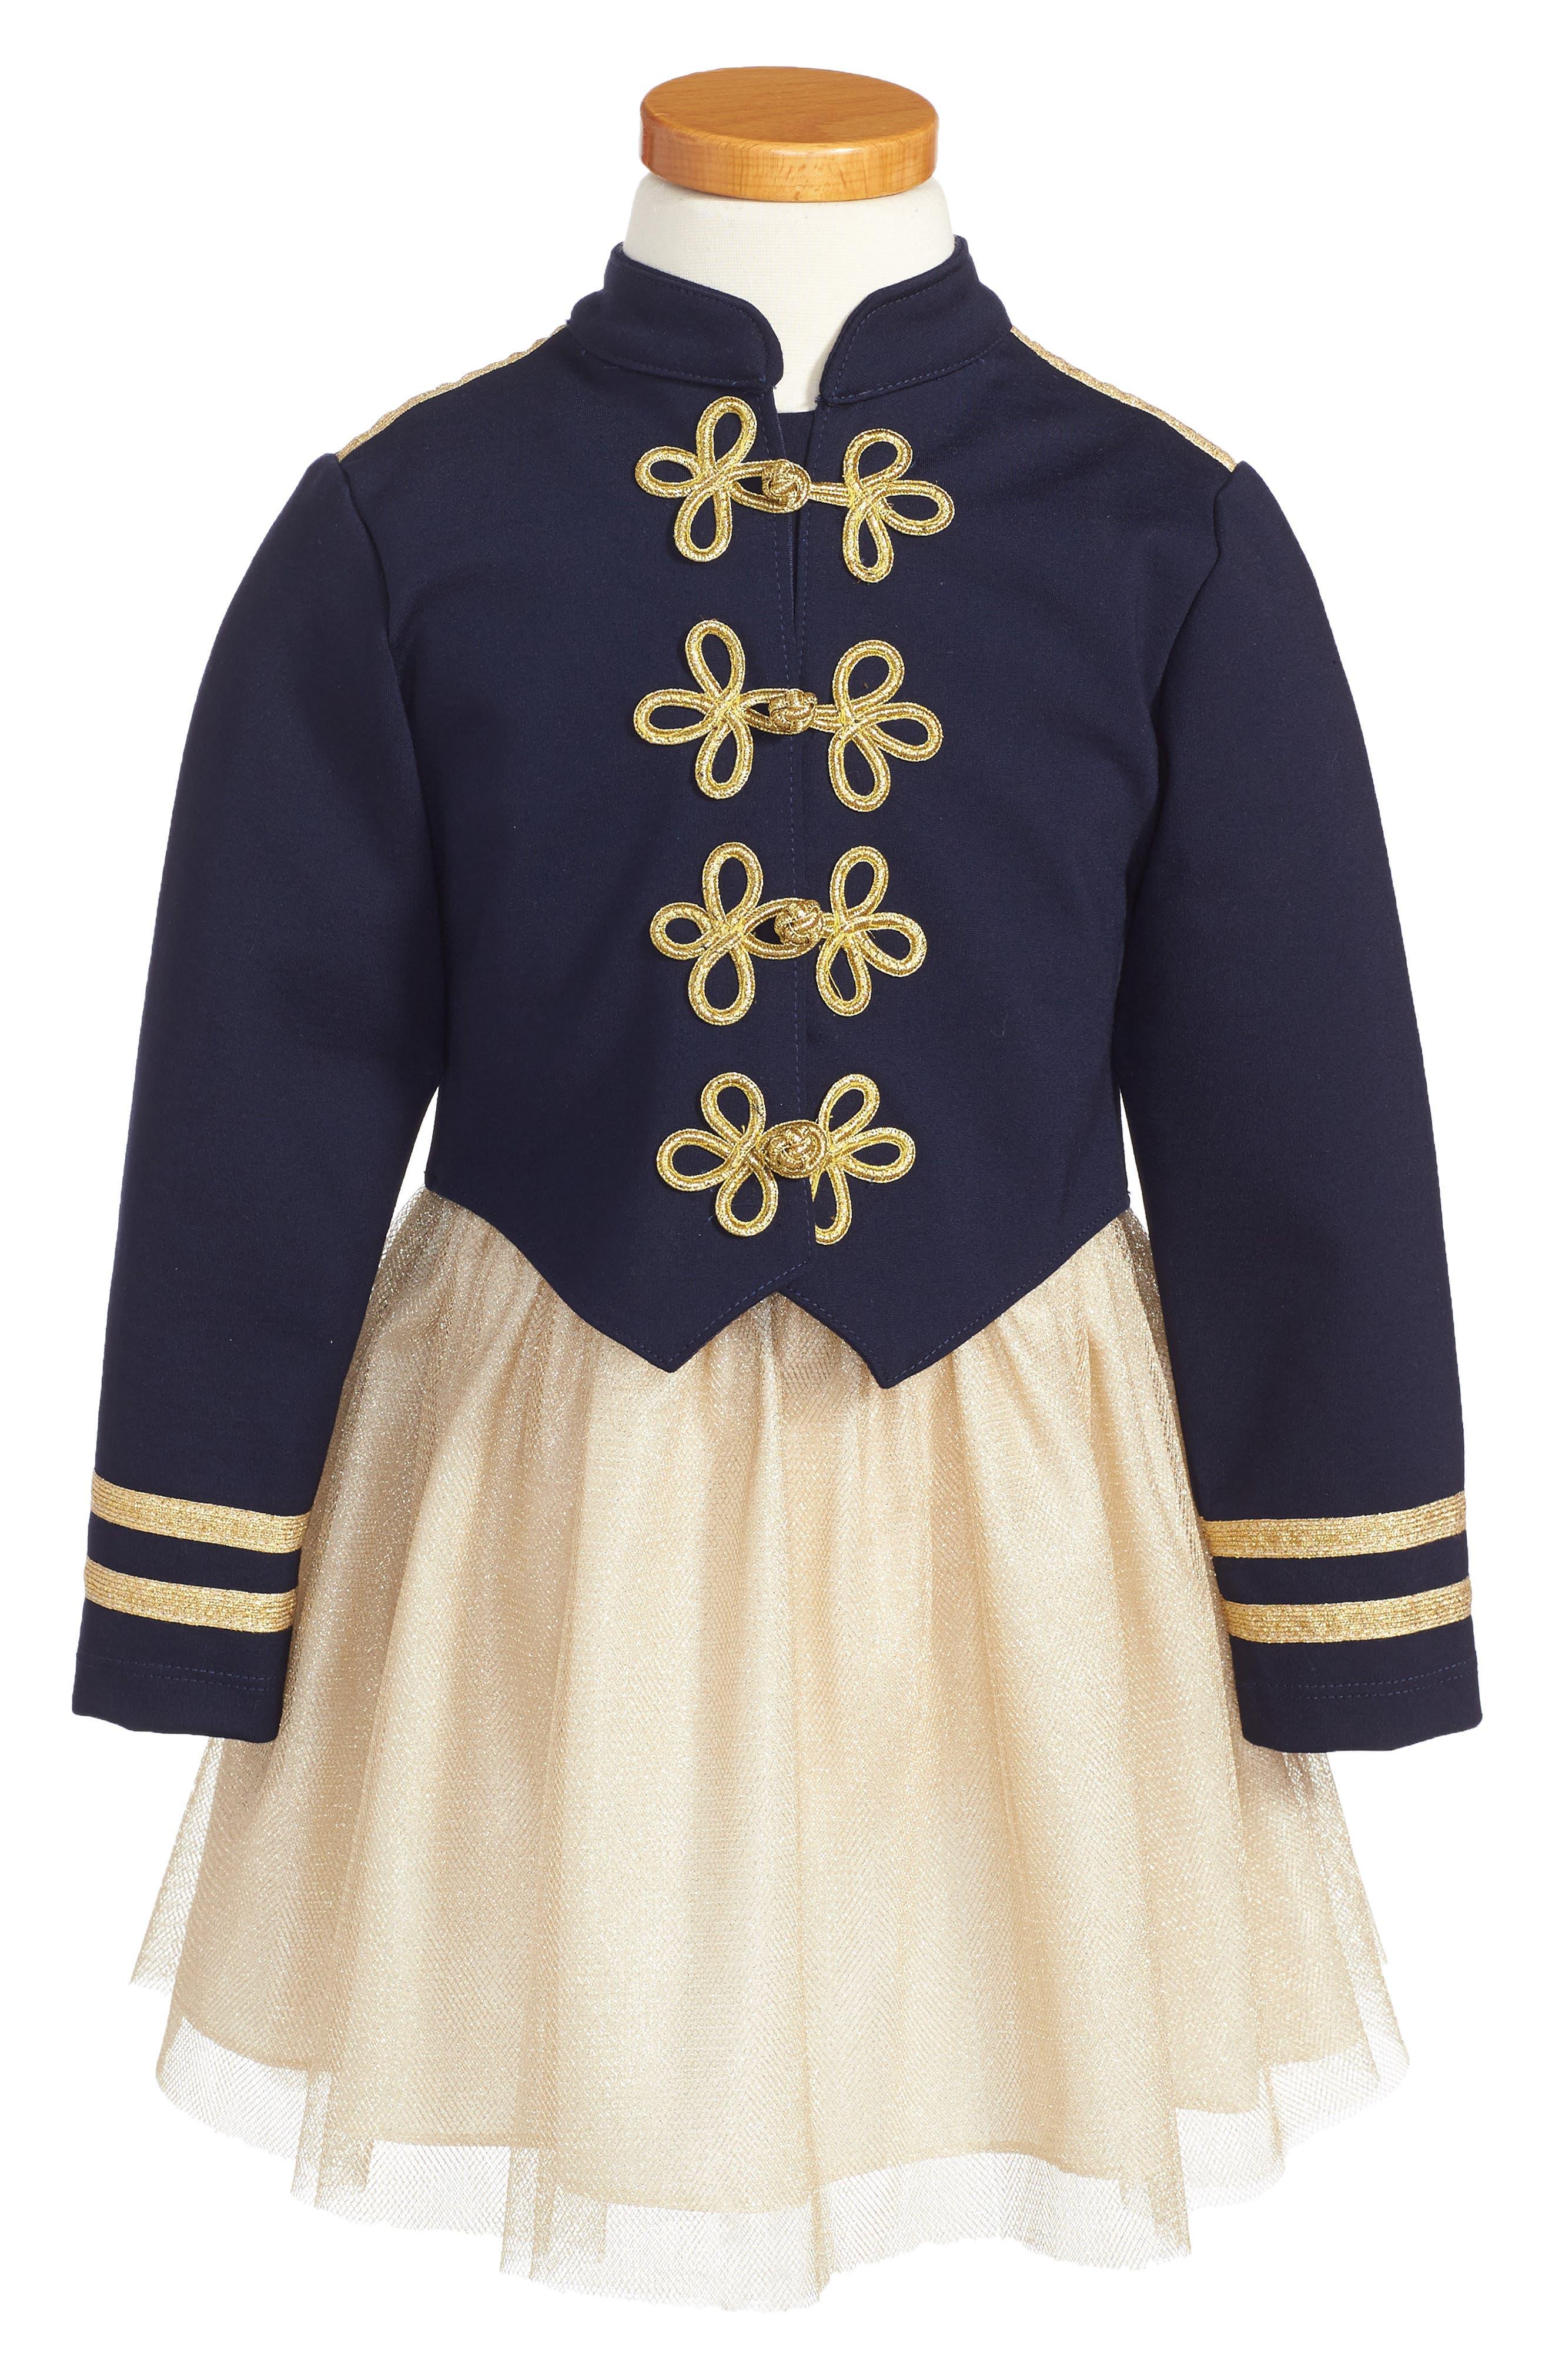 Majorette Jacket & Tank Dress Set,                             Main thumbnail 1, color,                             Navy/ Gold